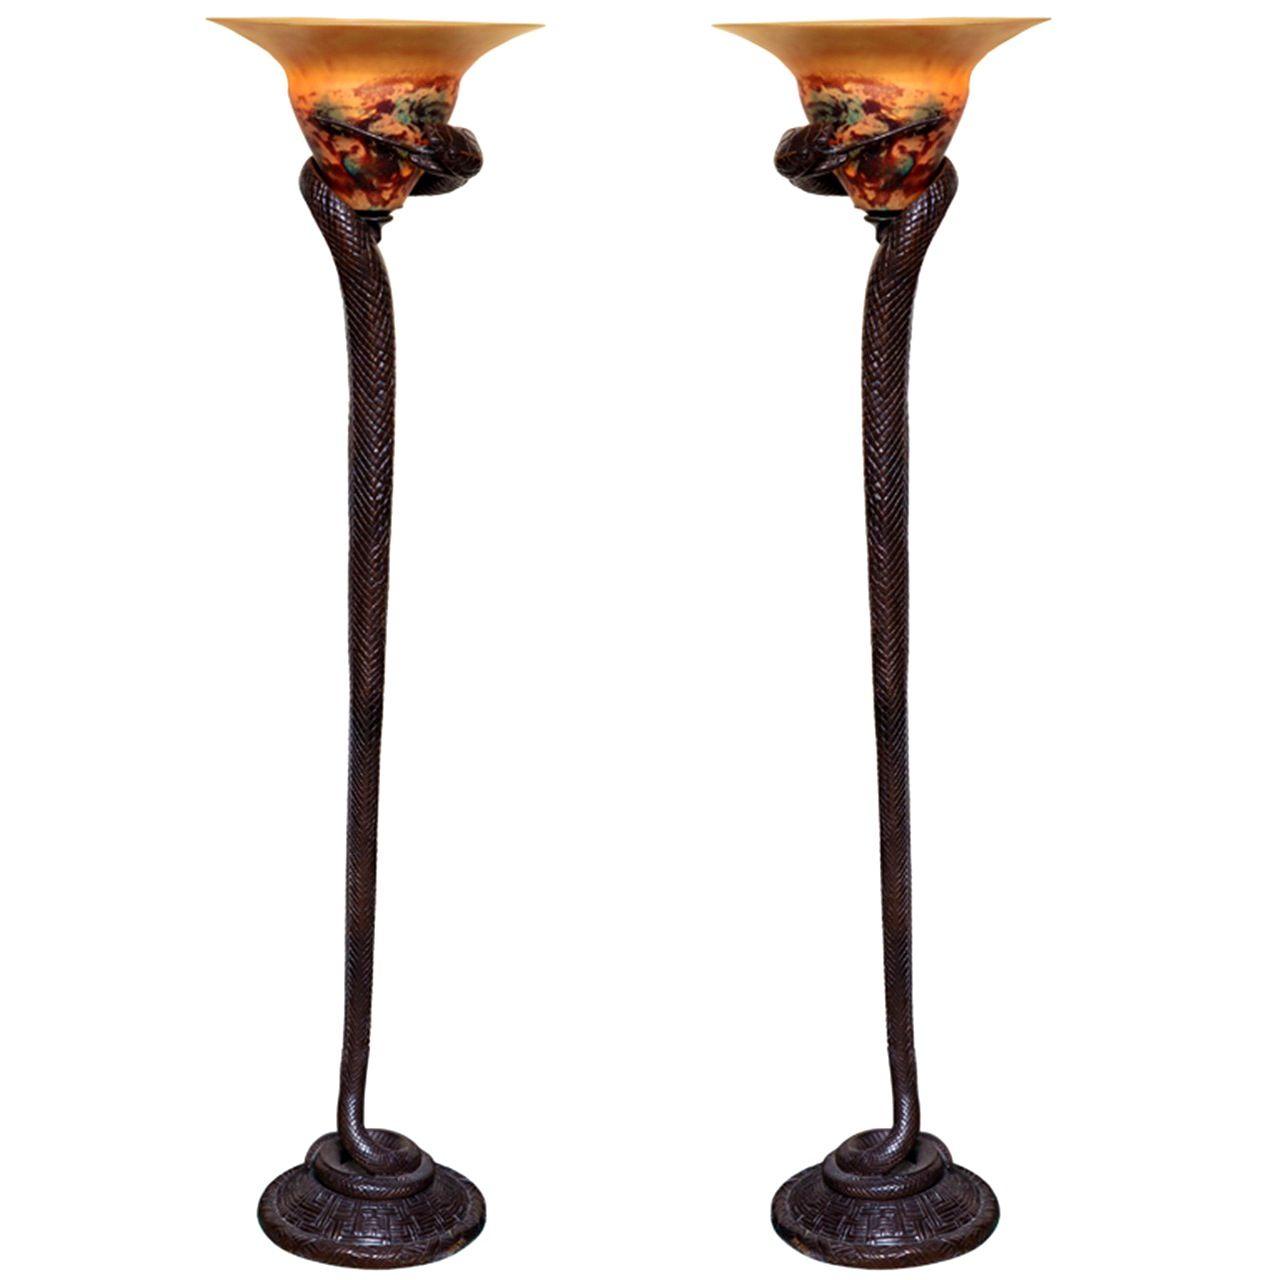 Art Deco Floor Lamp | liminality360.com